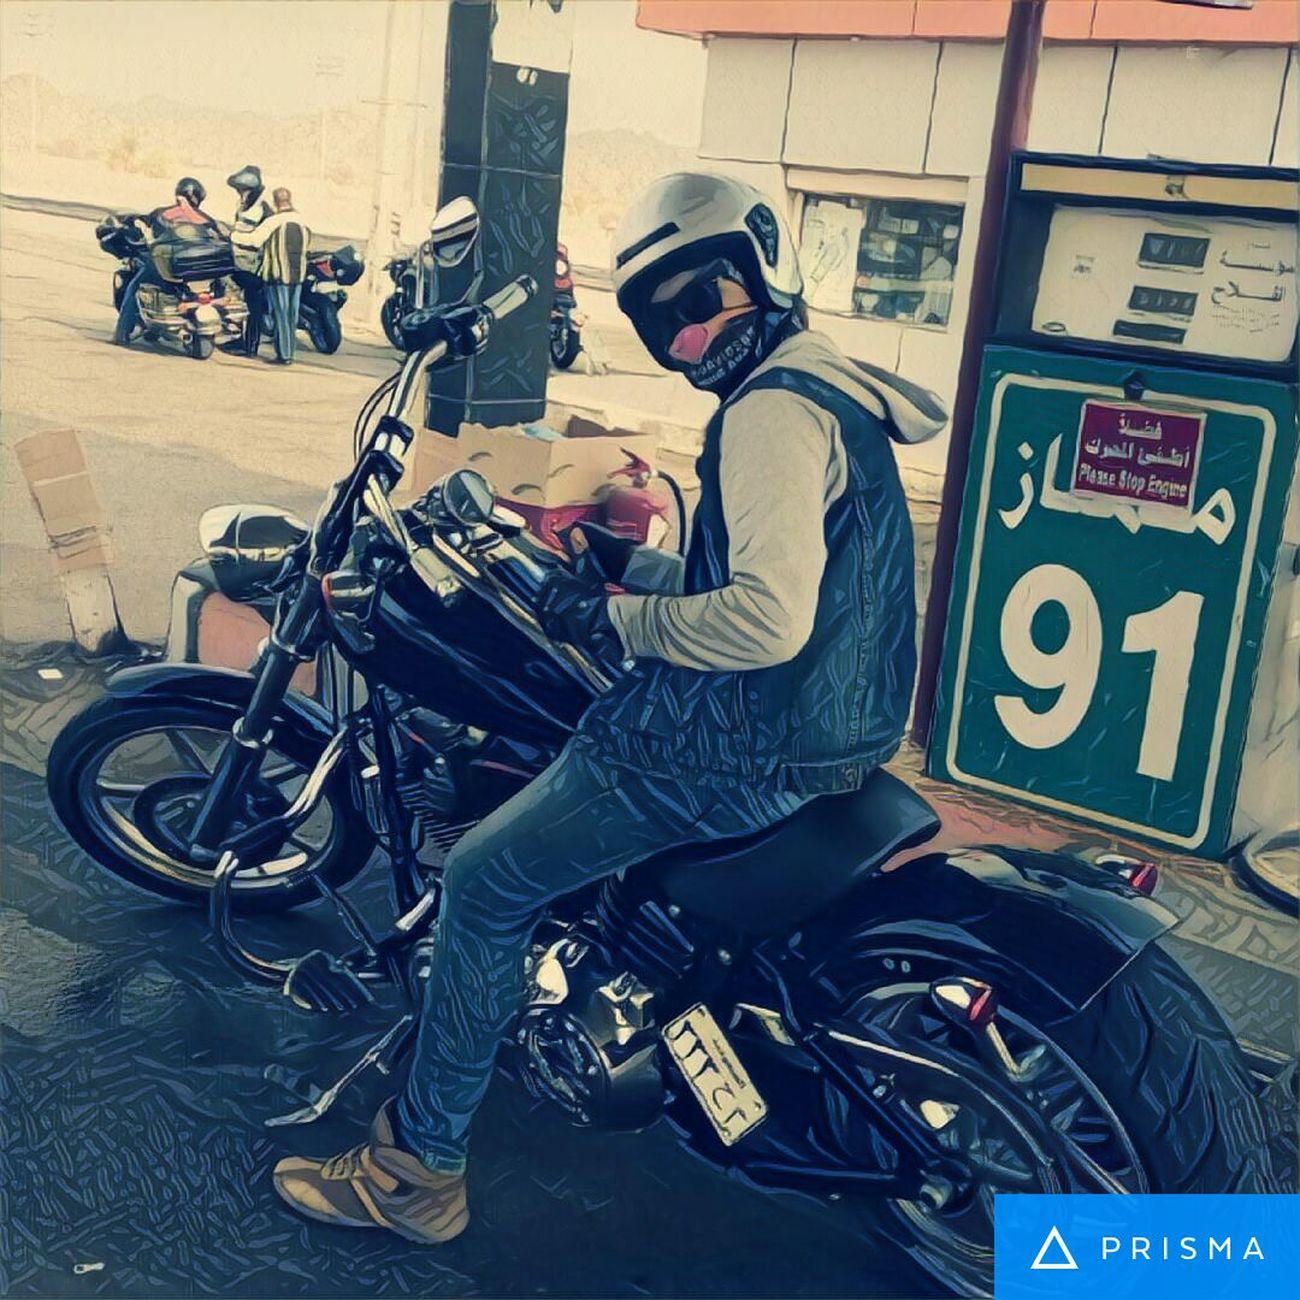 Harly Davidson Enjoying Life Bestshotz_usa Jeddah😍❤️ Hog. Chilling Tour Style ✌ Hanging Out Arabs